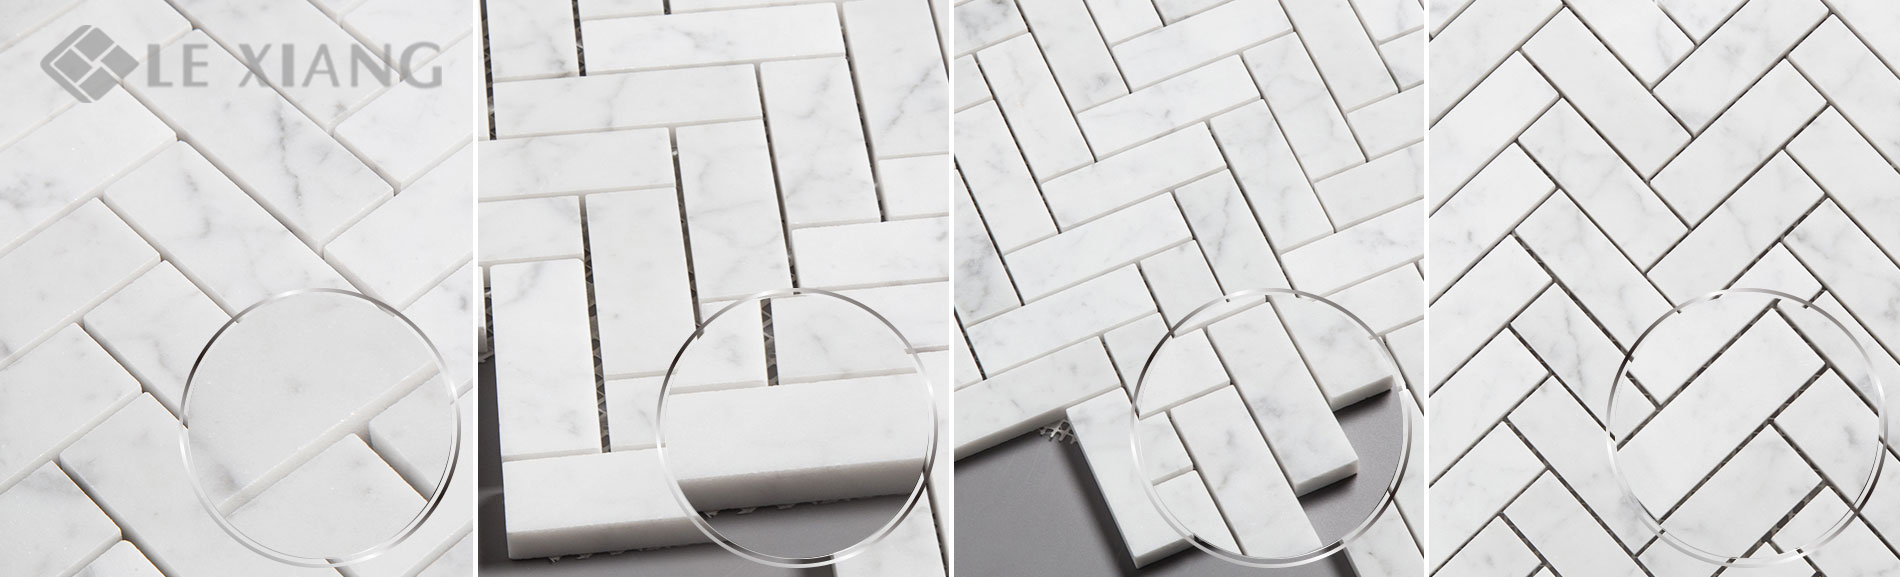 Carrara-Herringbone-Stone-Mosaic-Tiles-For-Bathroom-Floors-4